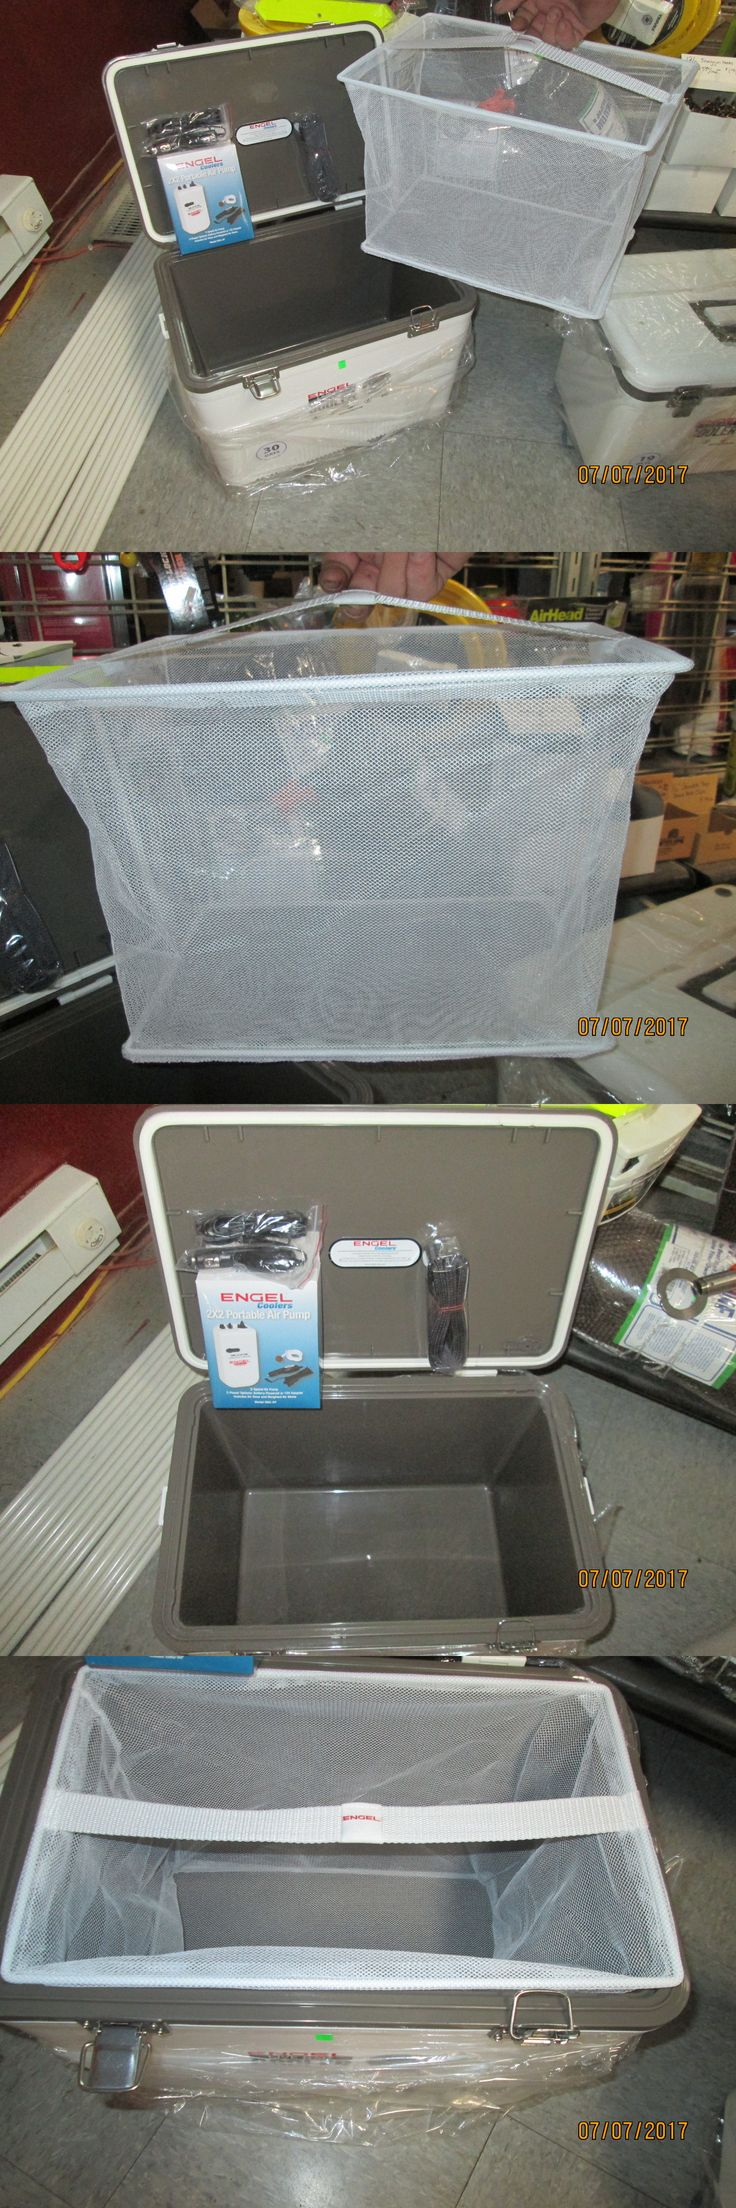 Bait Buckets 179986: Newest Model New 30 Qt Engel Live Bait Cooler W Full Size Net Aerator Englbc30n -> BUY IT NOW ONLY: $85 on eBay!